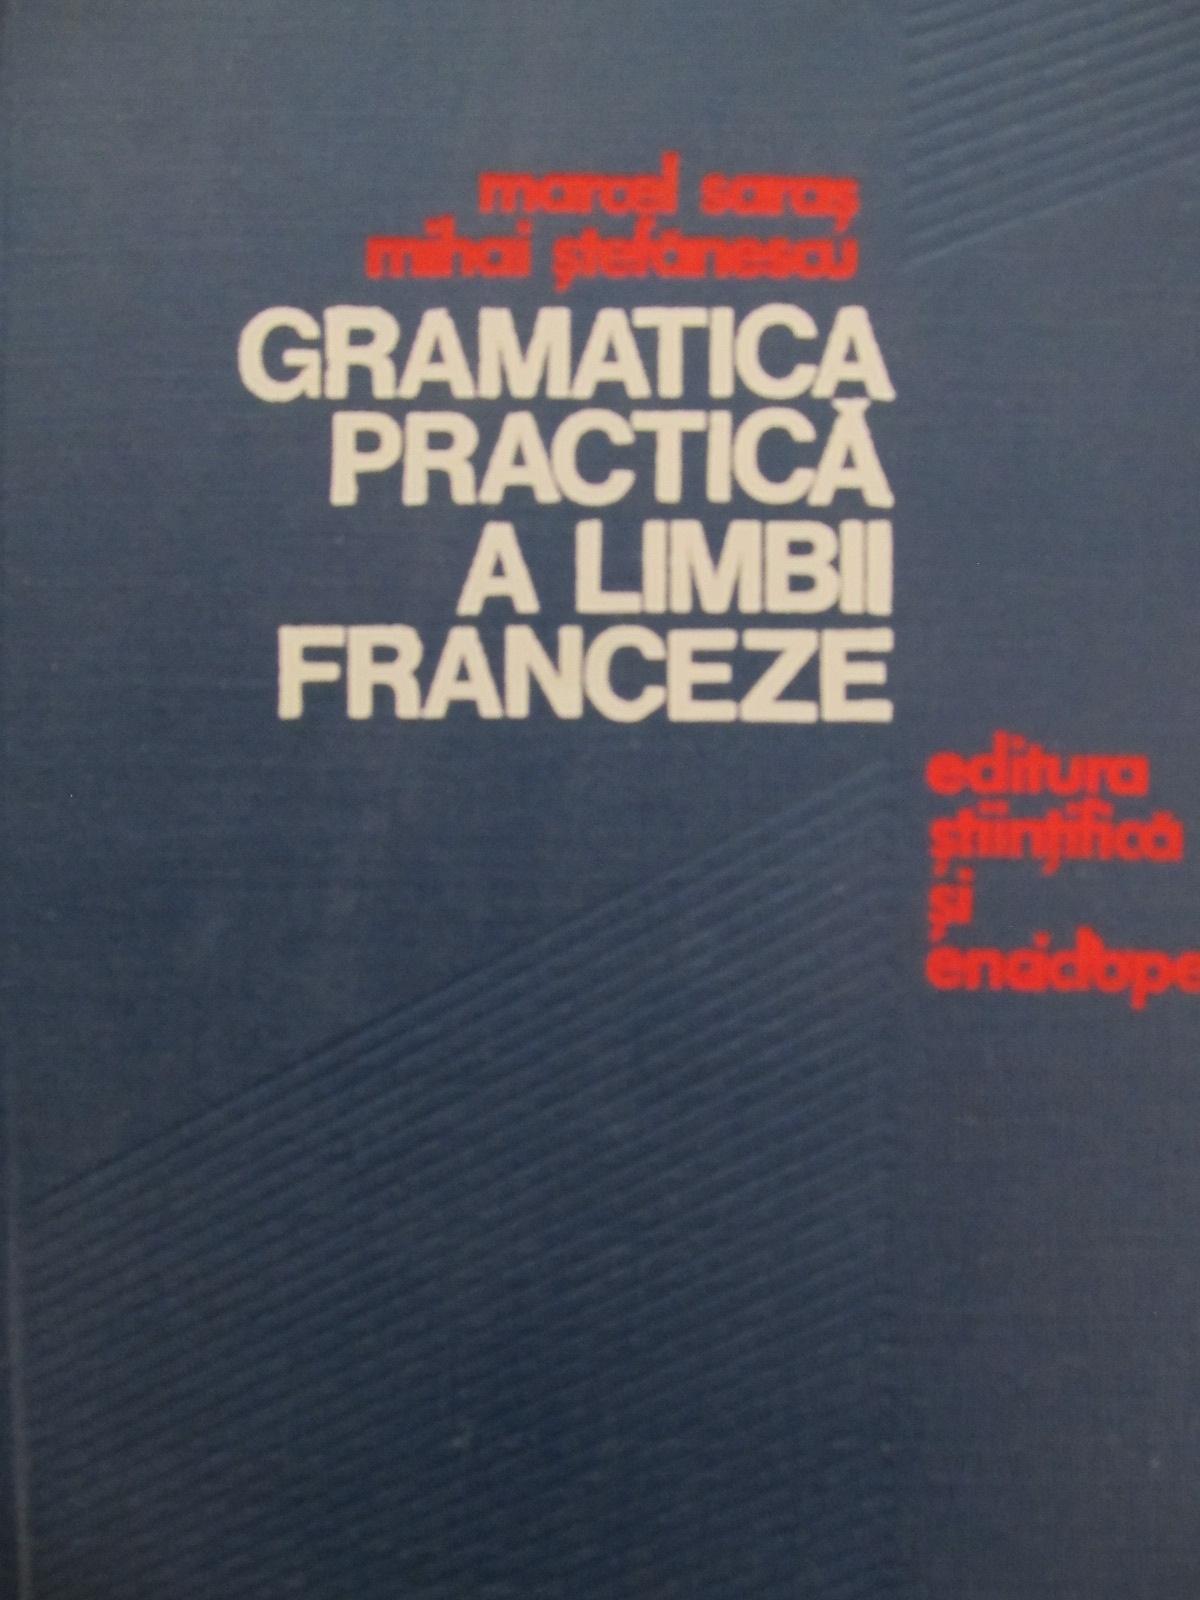 Gramatica practica a limbii franceze [1] - Marcel Saras , Mihai Stefanescu | Detalii carte